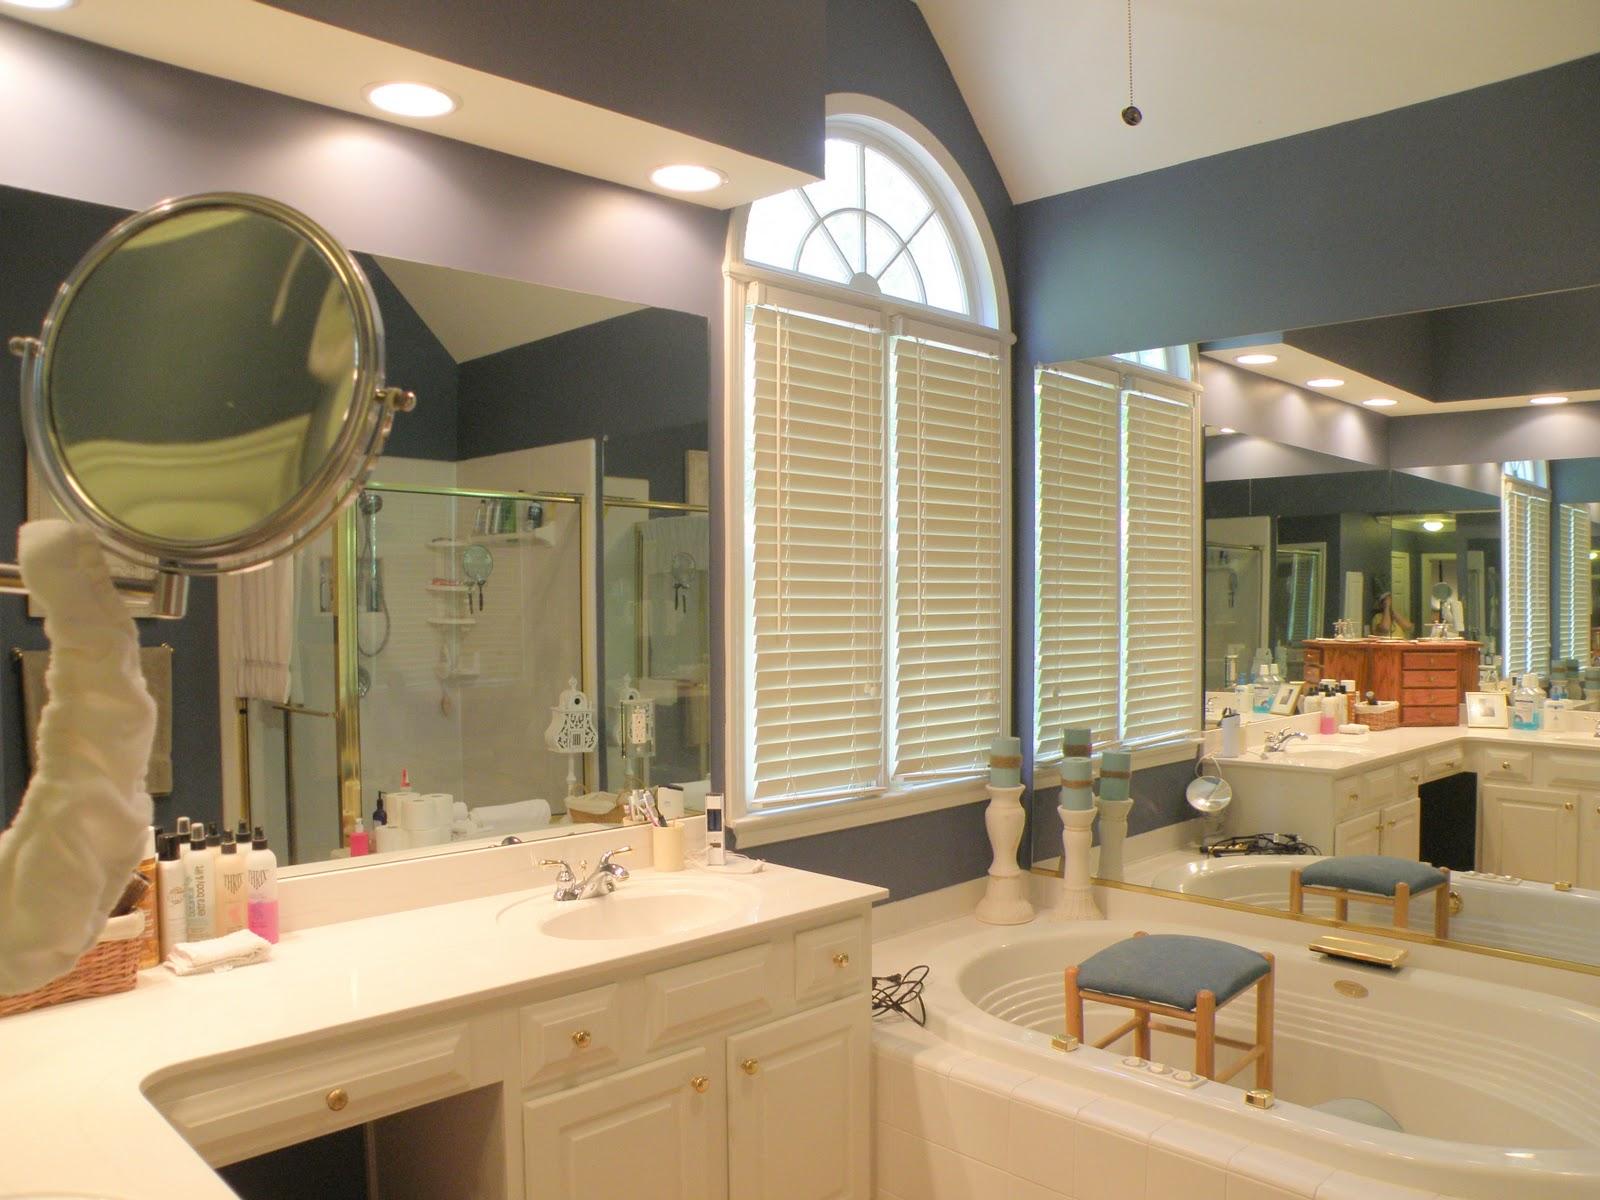 Shanty Insanity Vintage Modern Master Bath Remodel - Total bathroom remodel